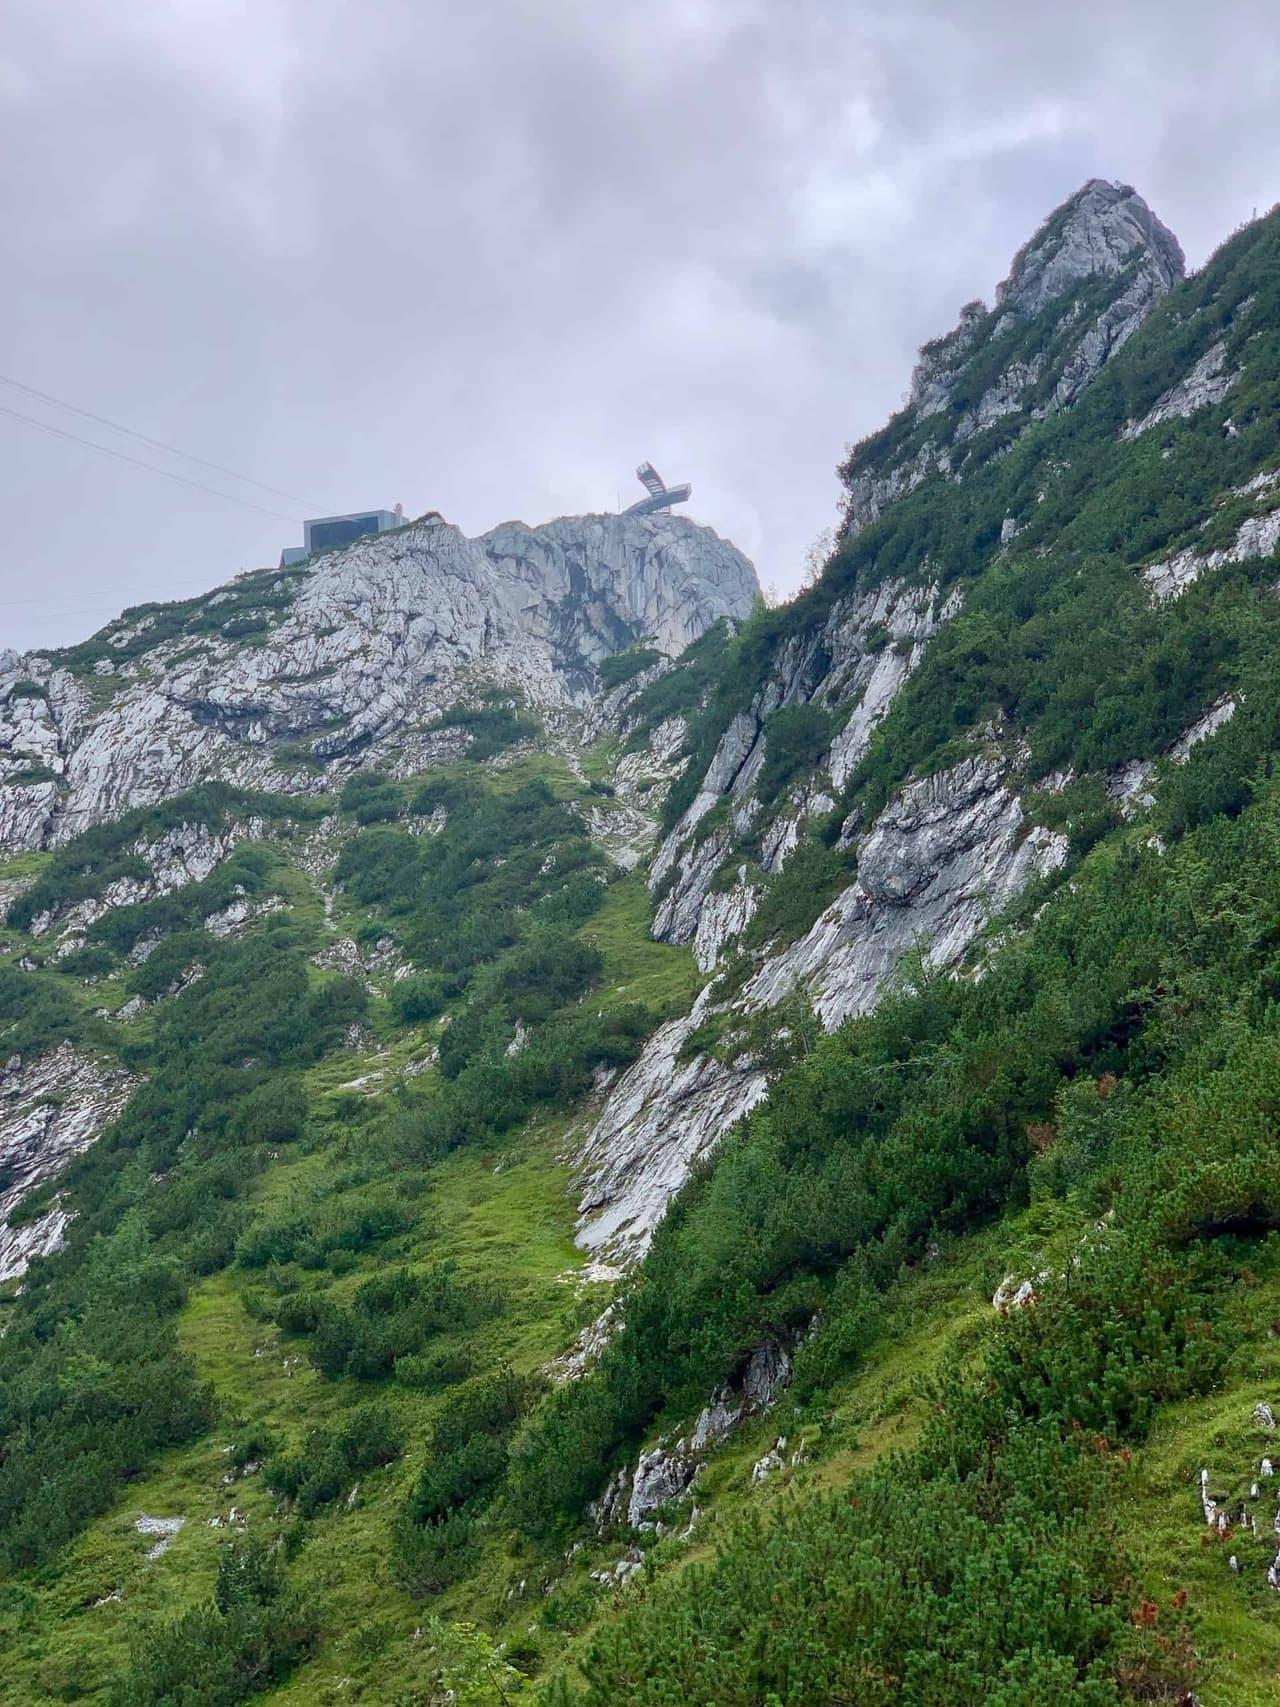 Hupfleitenjoch_Blick_Alpspitzbahn_und_Plattform